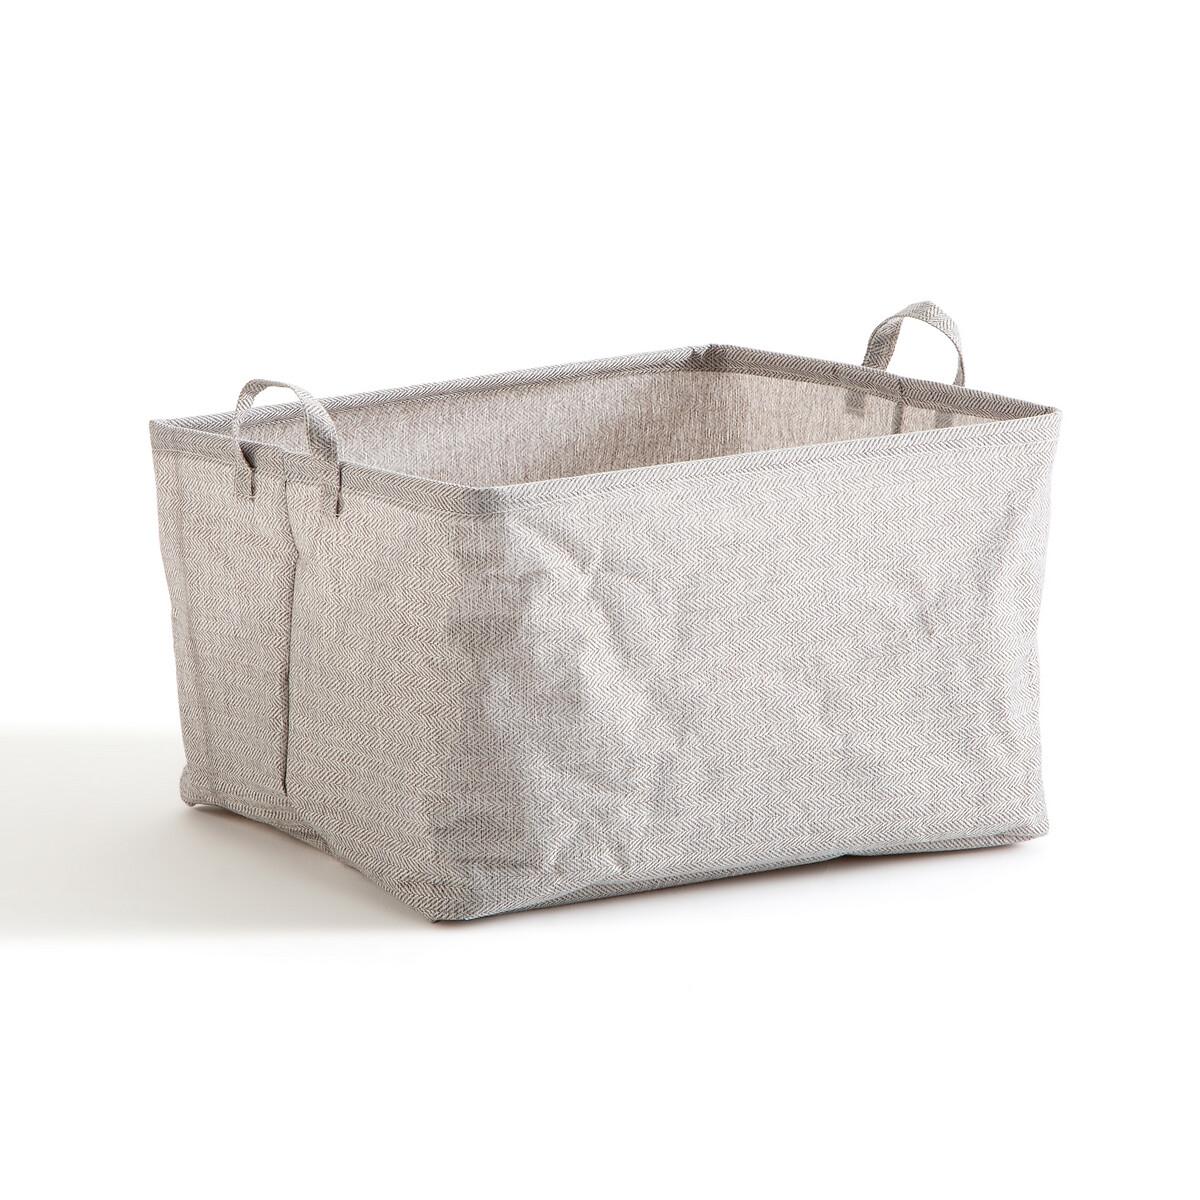 Фото - Корзина LaRedoute Monteo единый размер серый корзина laredoute для белья из ткани louison единый размер серый